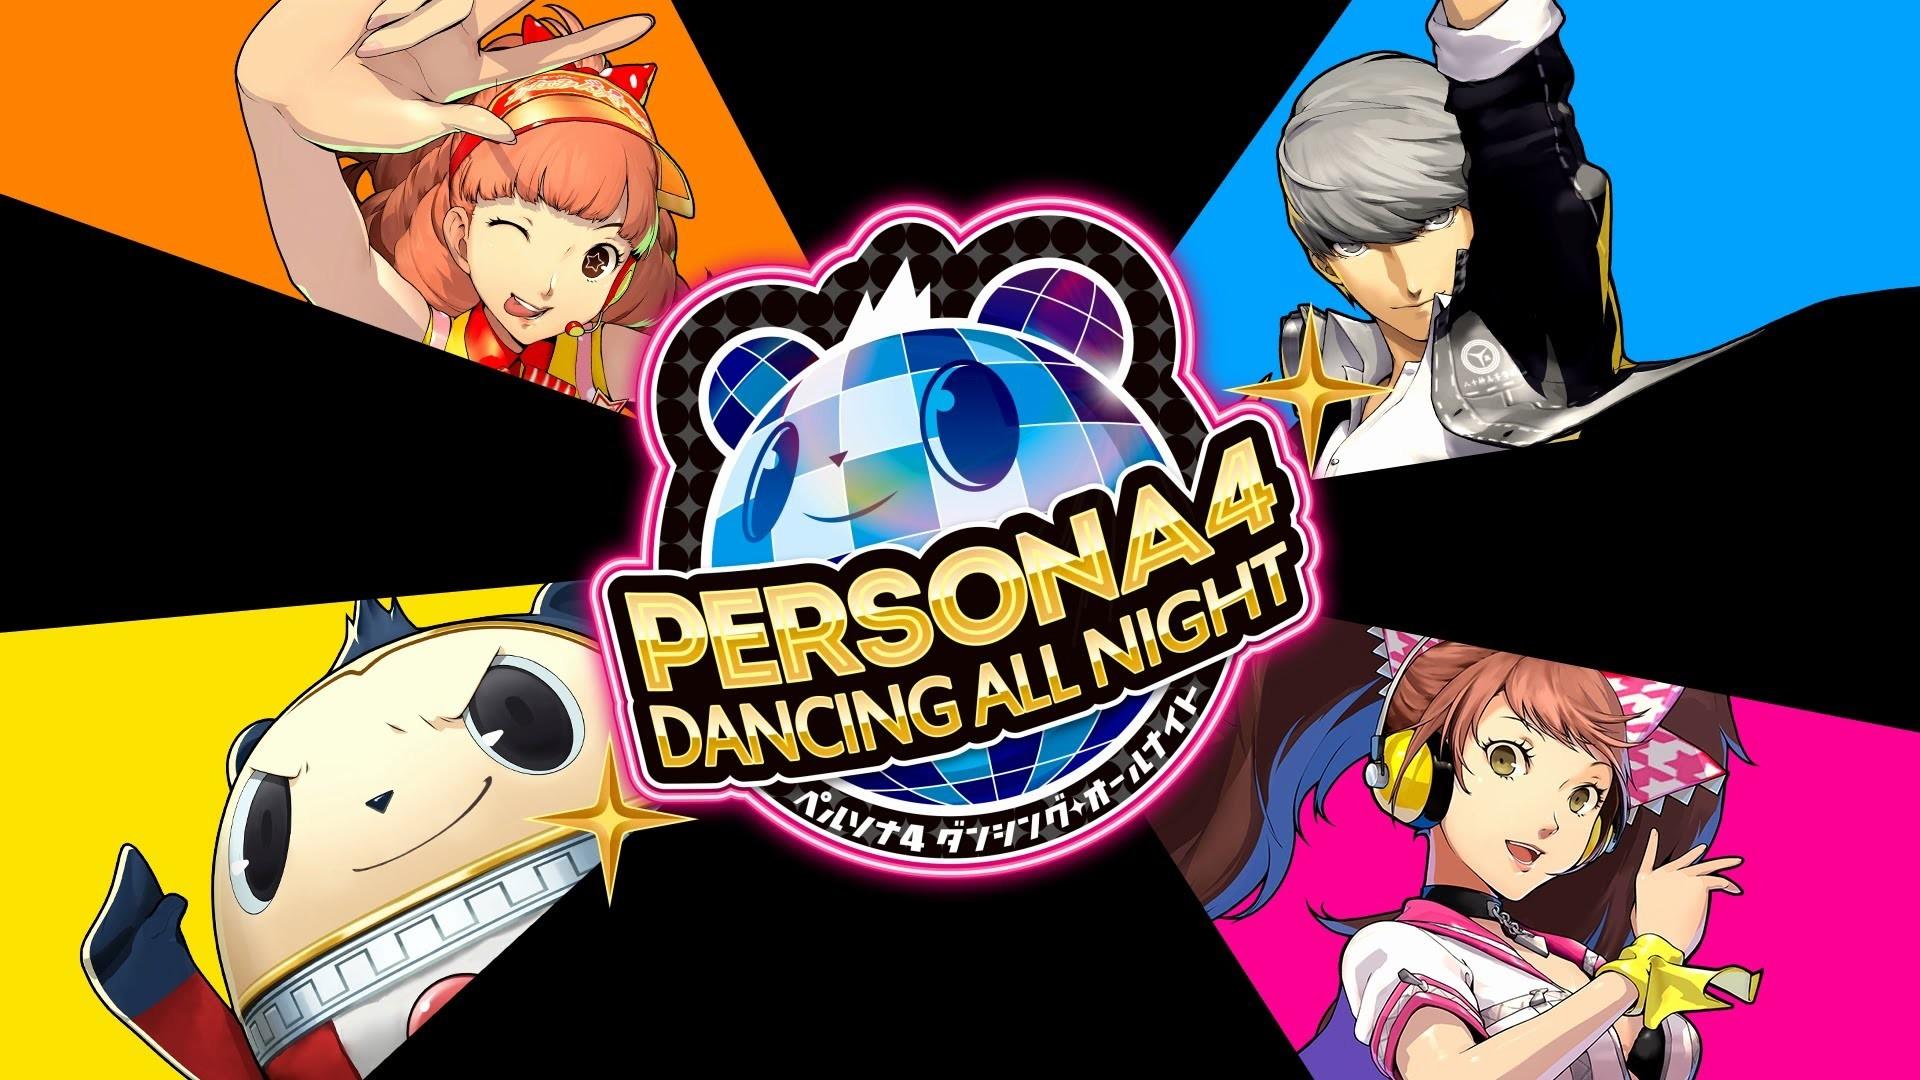 Persona 4 DAN – Yu Narukami HD Wallpaper by seraharcana on DeviantArt